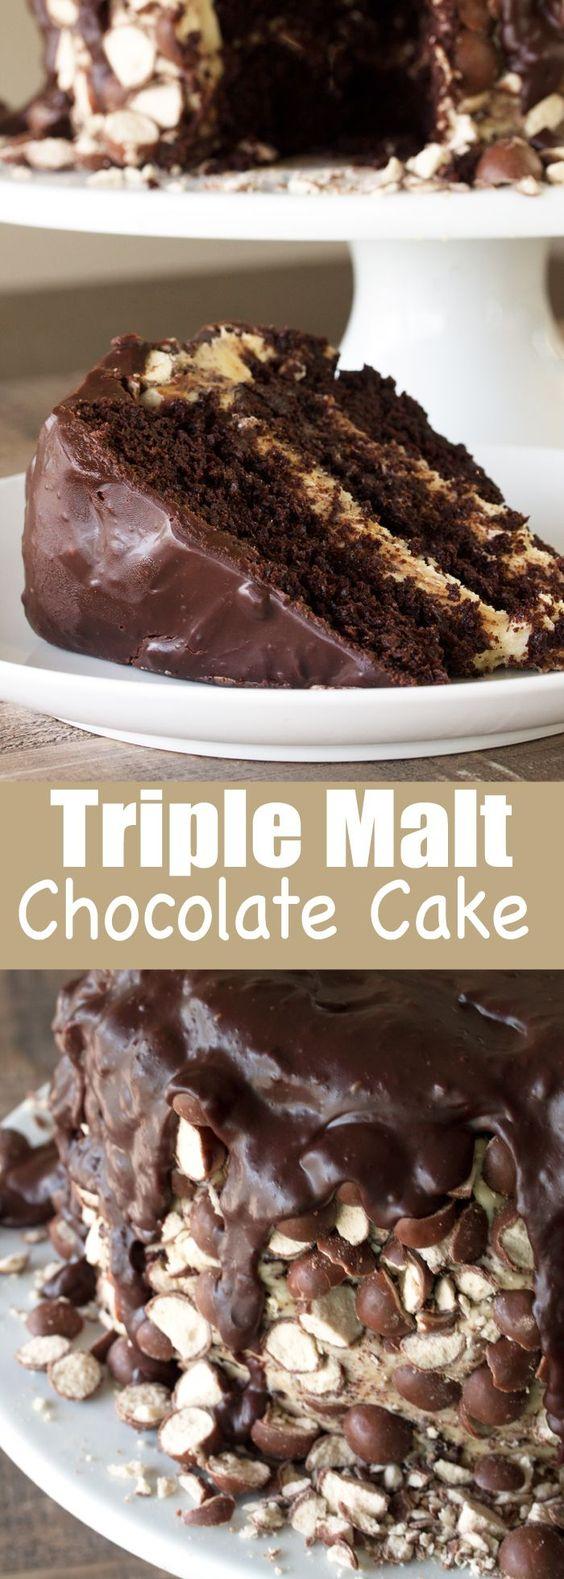 Triple Malt Chocolate Cake | Recipe | Chocolate cakes ...